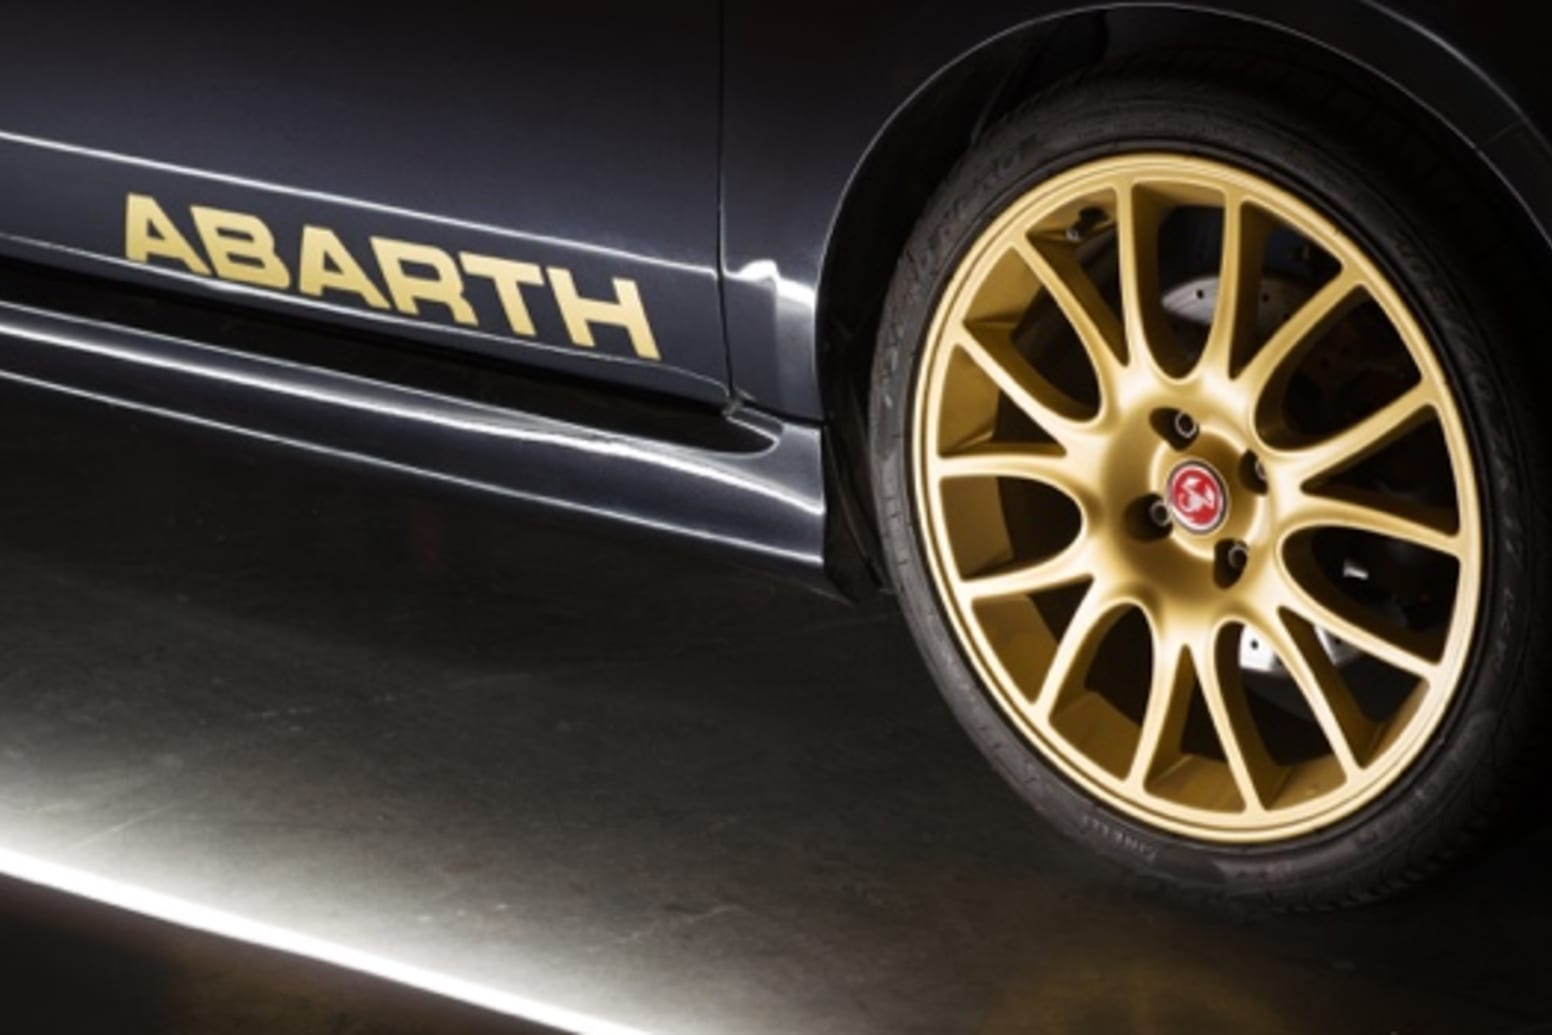 Abarth 595 Scorpioneoro Wheels